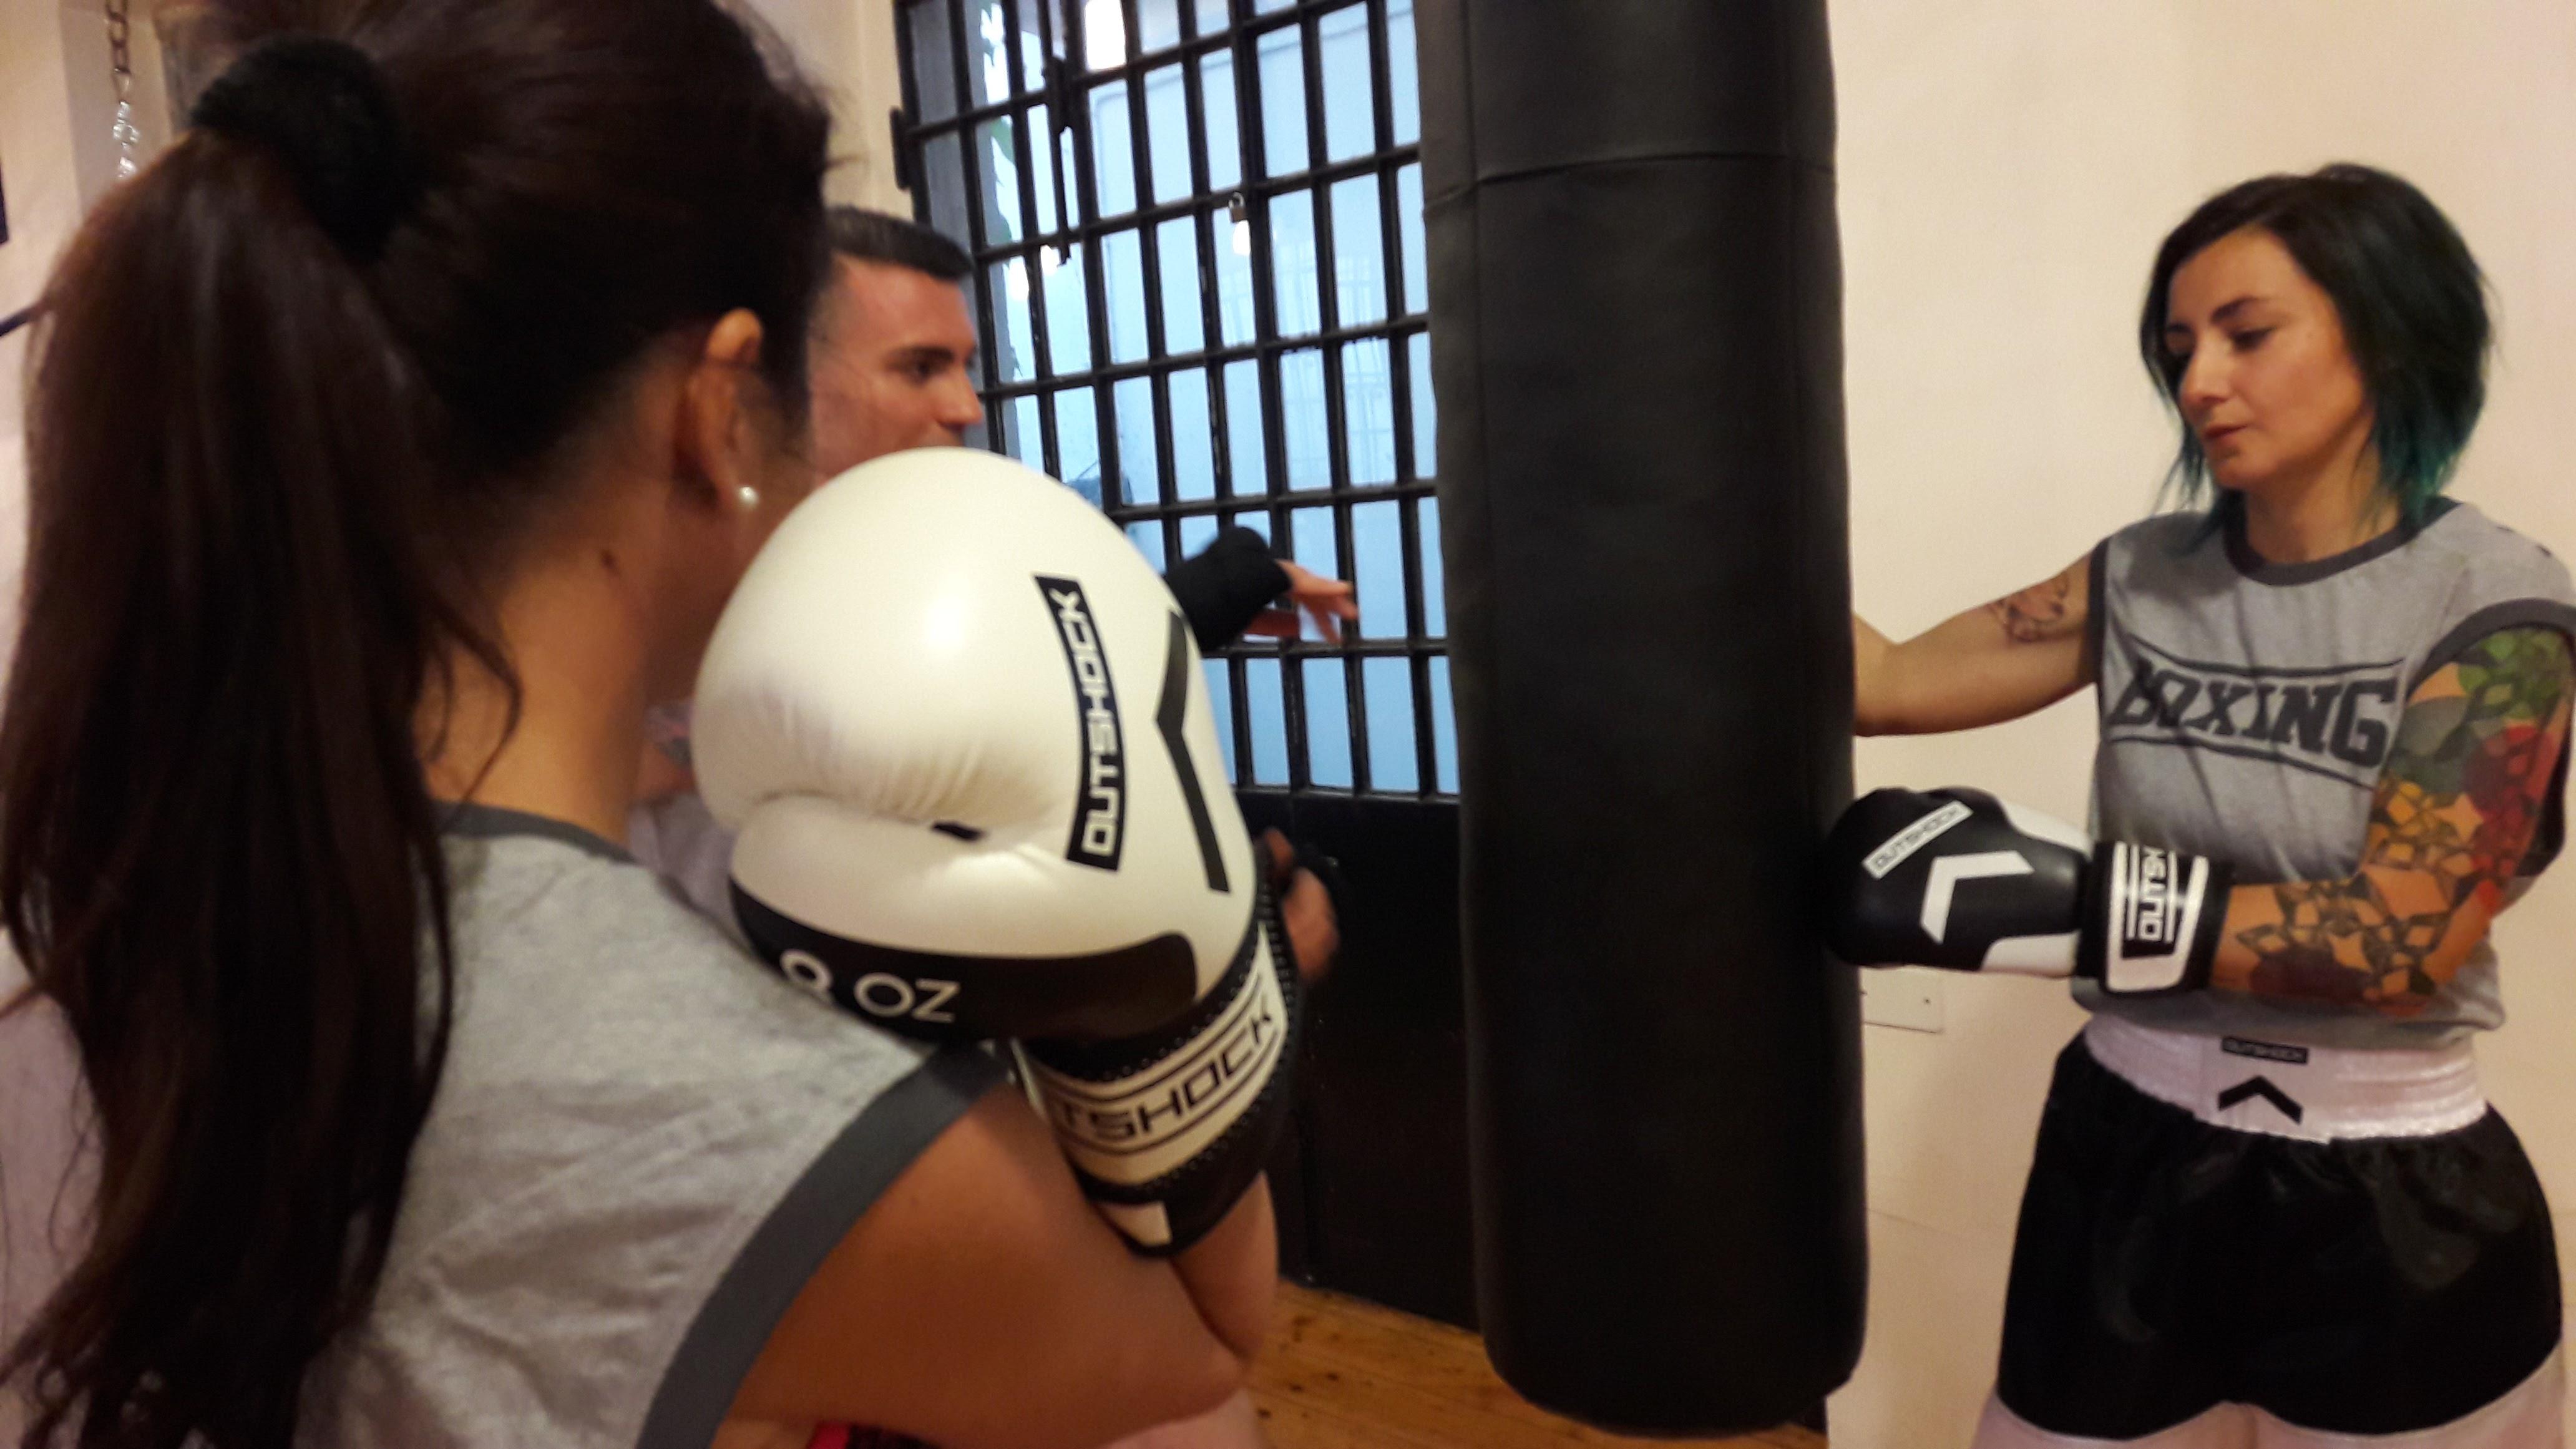 A scuola di boxe con Outshock by Decathlon